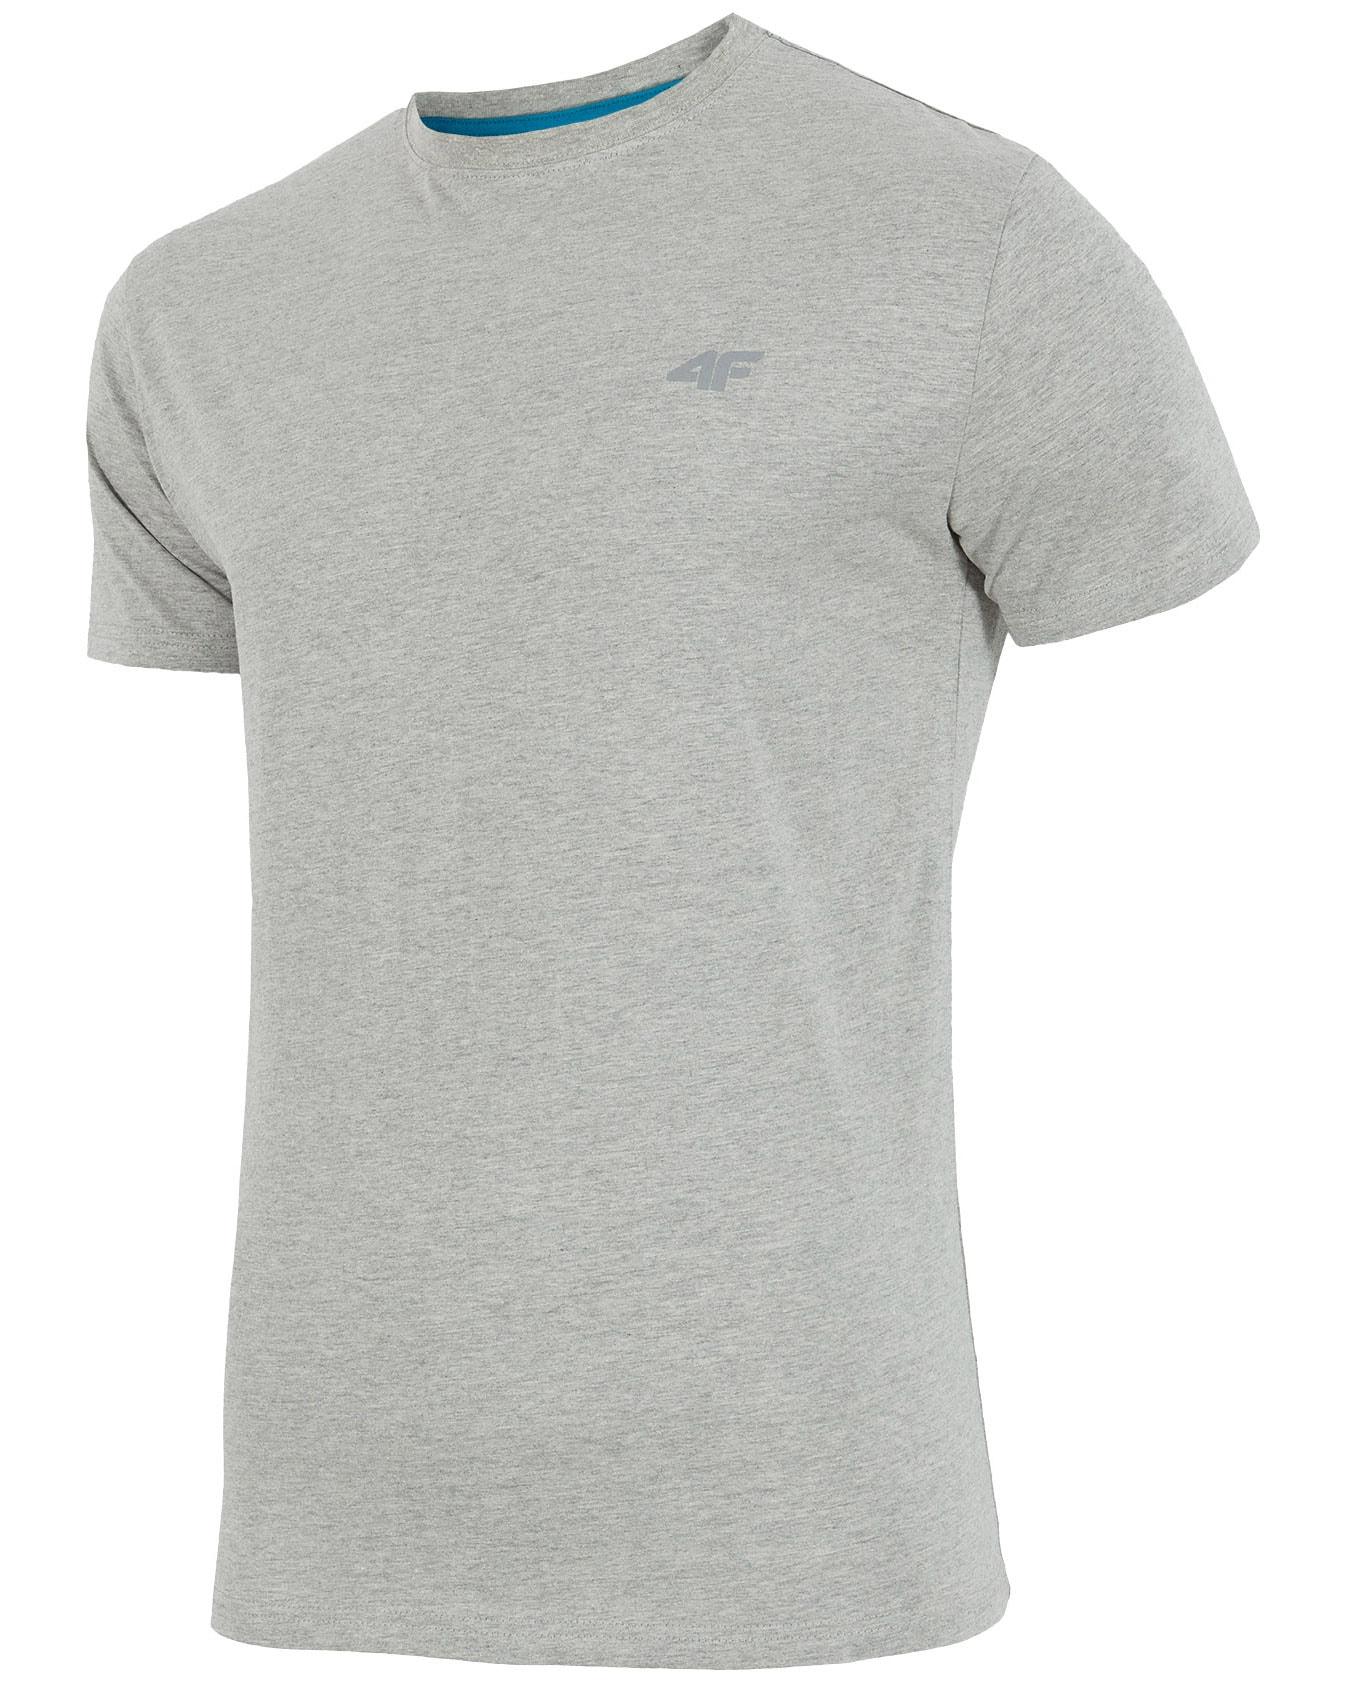 2XU Urban Short Sleeve Herre T skjorte Moon Grey Marle